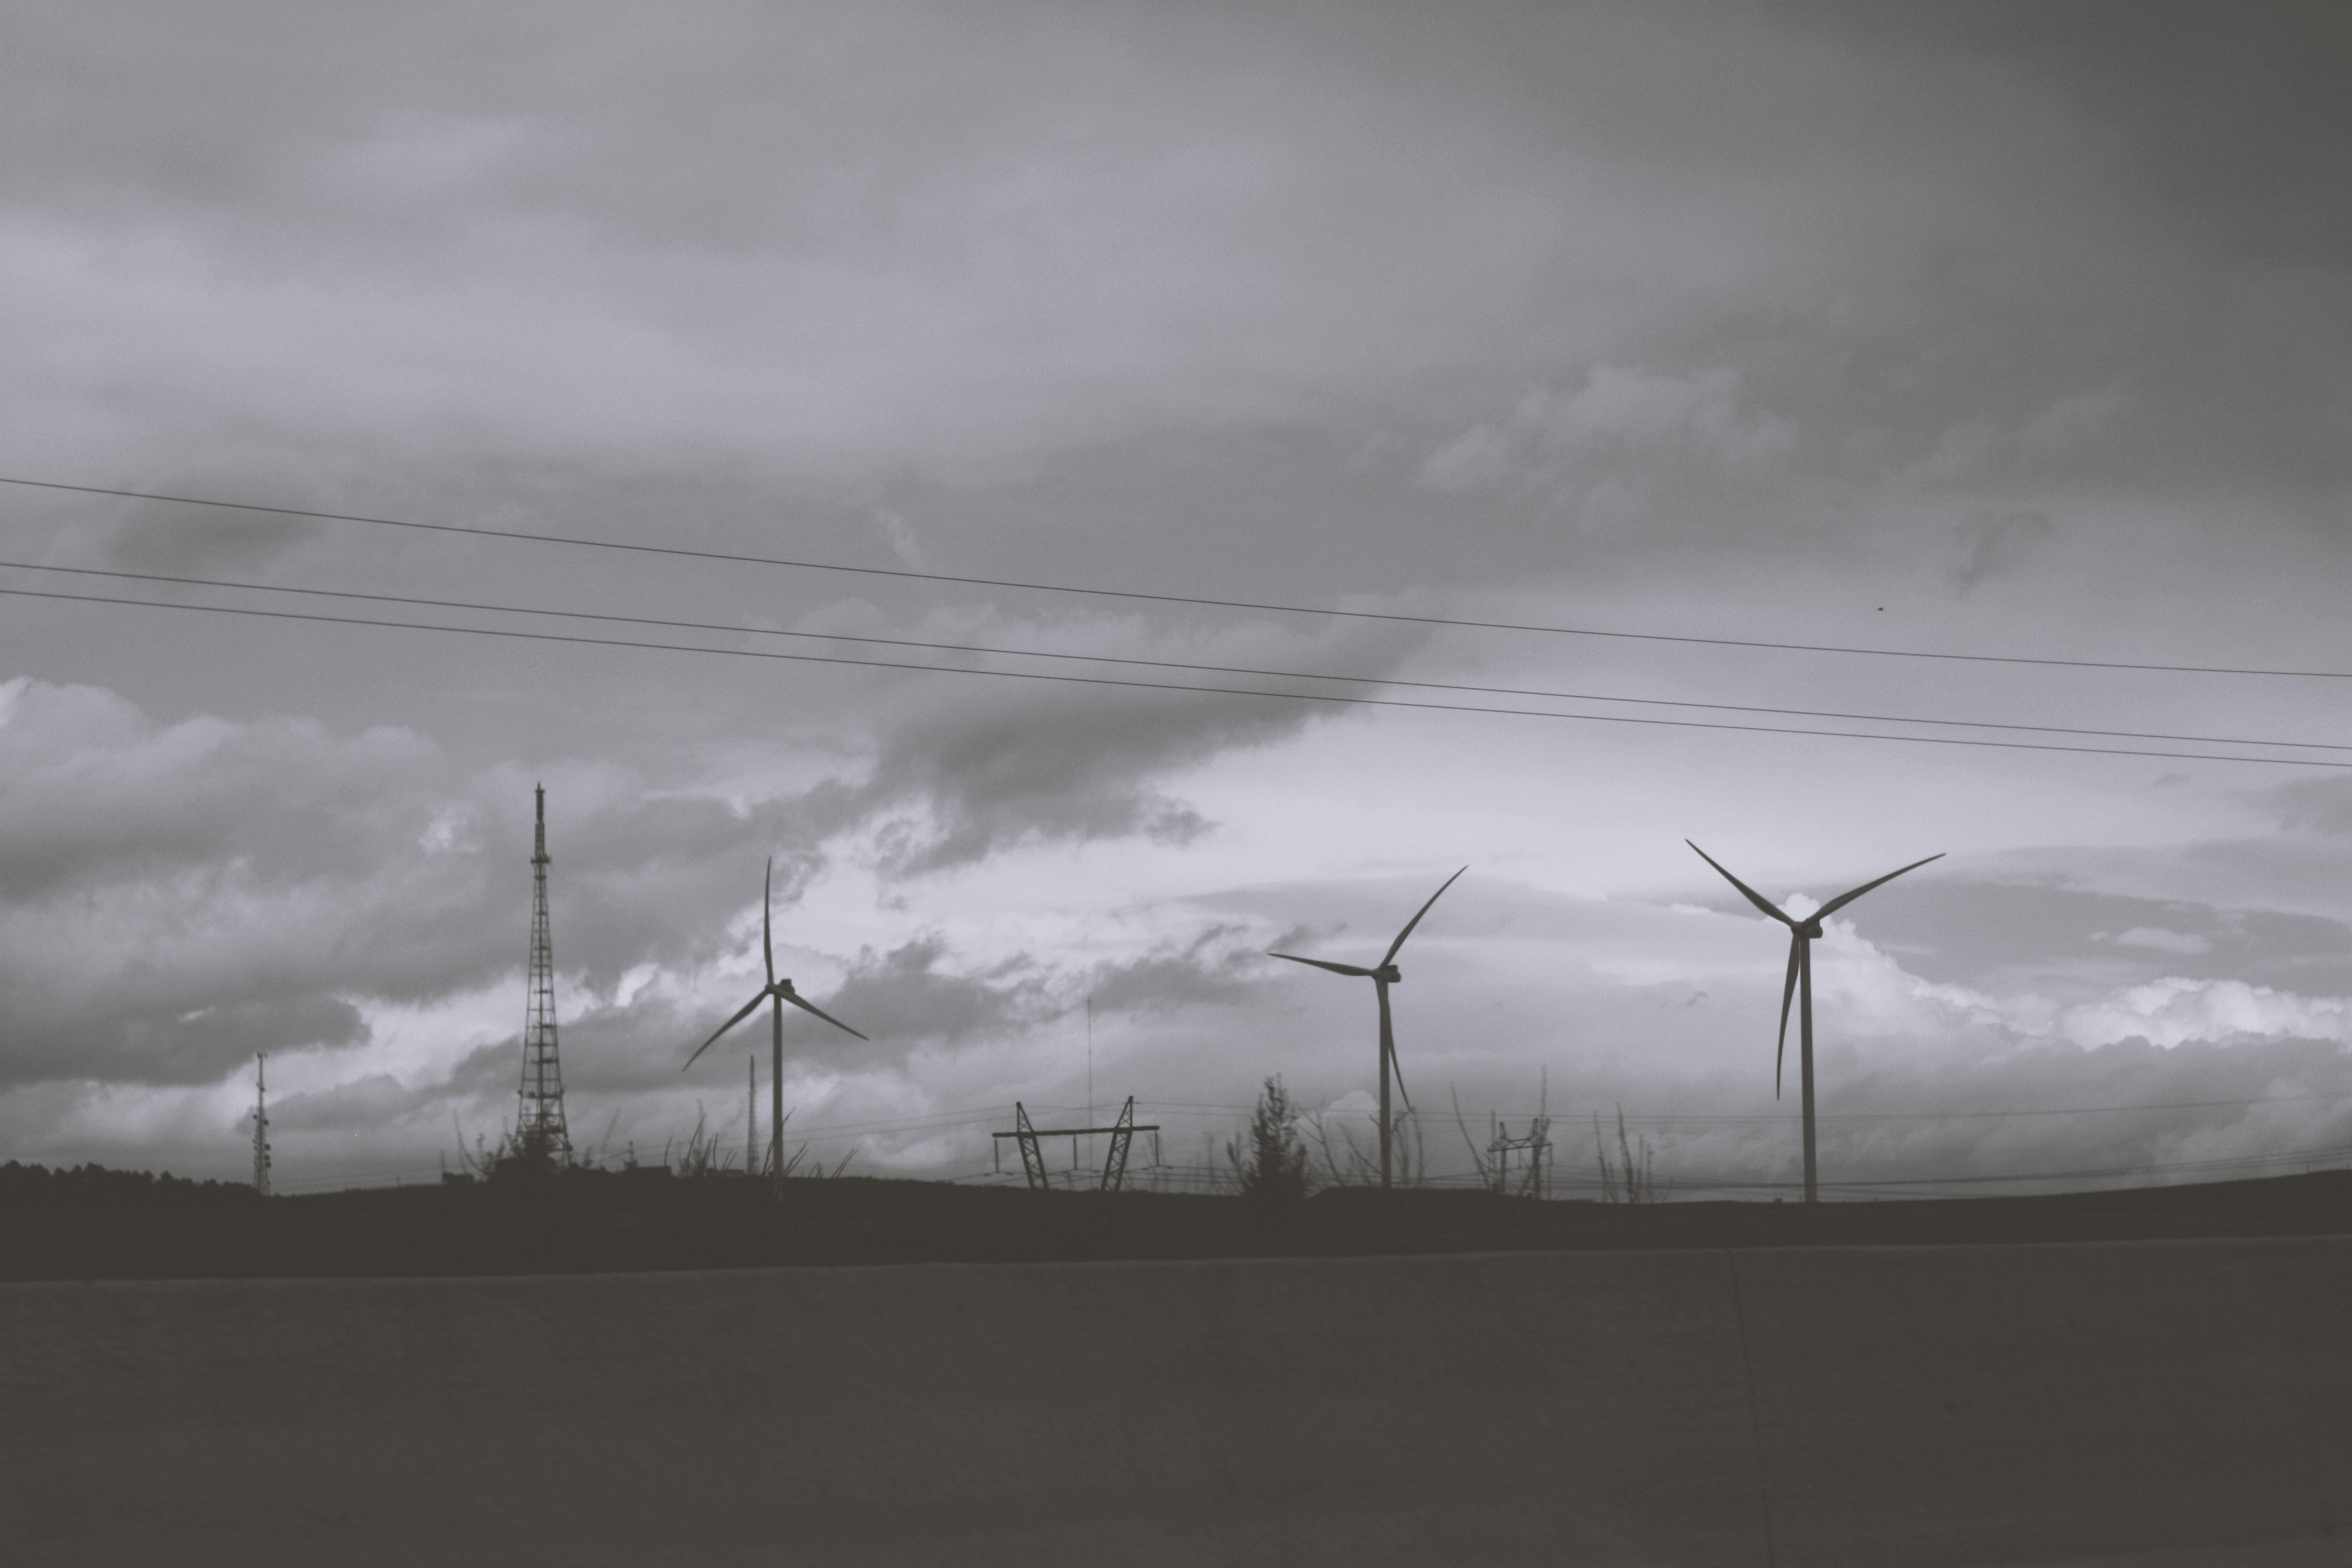 Three wind mills under cloudy sky photo